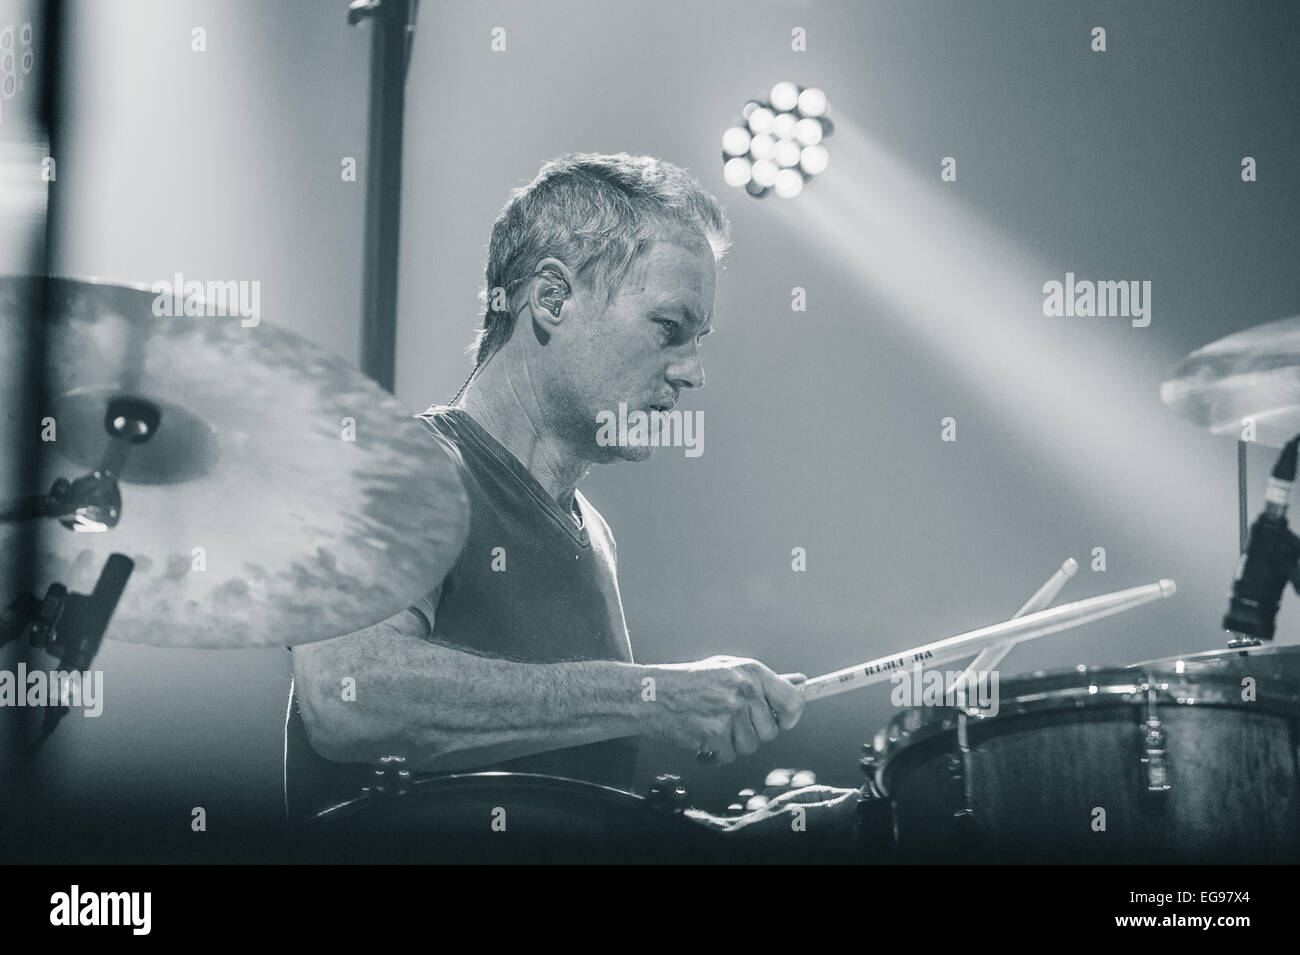 Toronto, Ontario, Canada. 19th Feb, 2015. JOHNNY FAY, drummer of ...